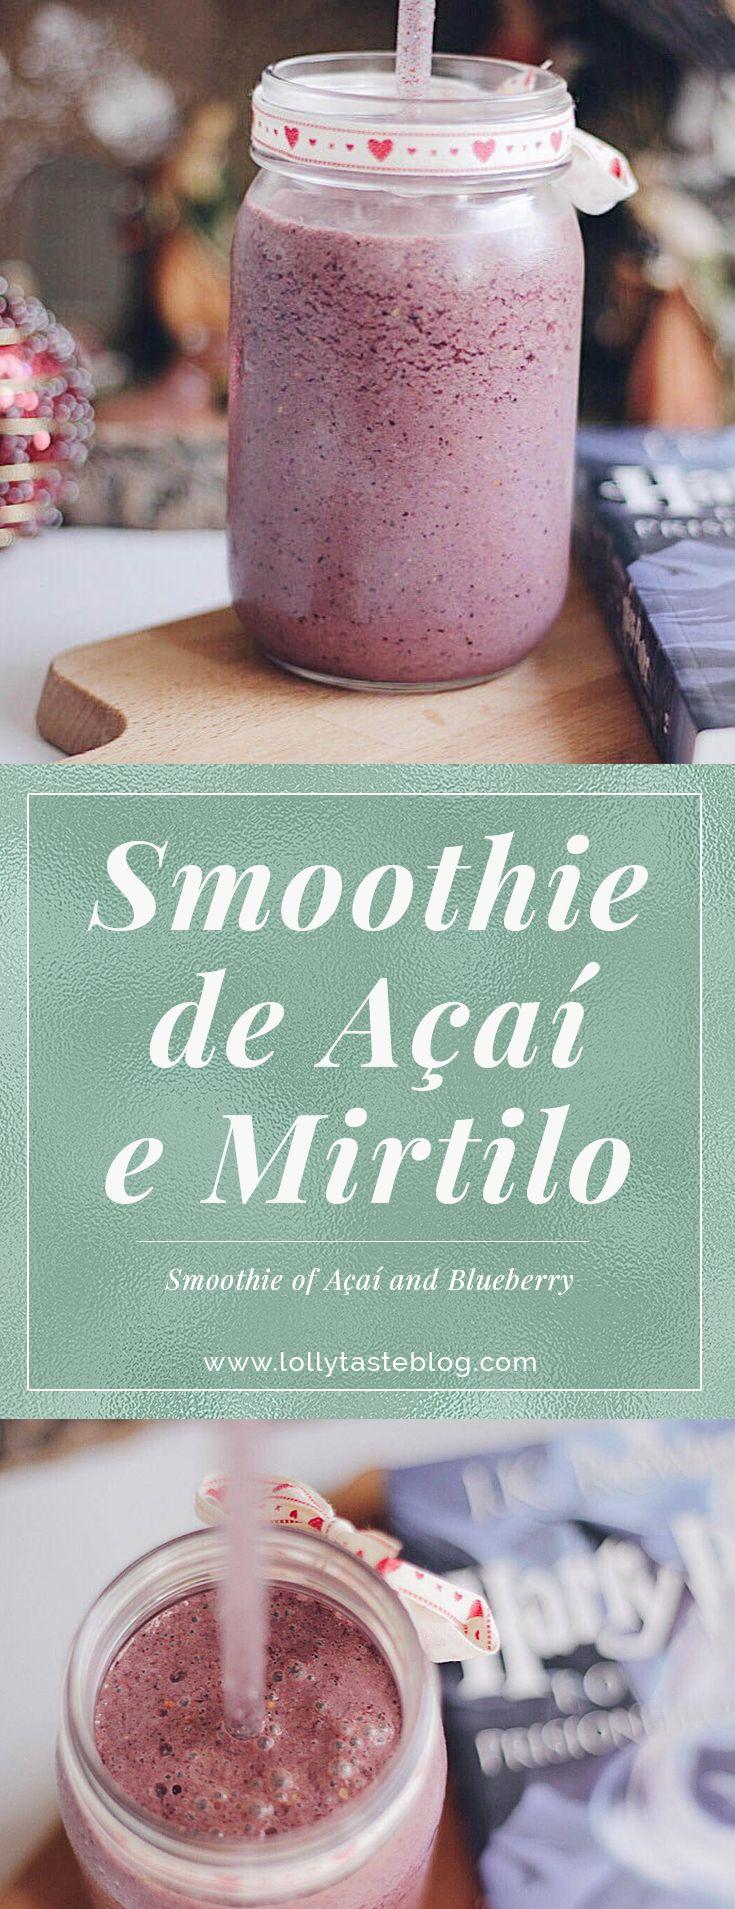 Um delicioso smoothie de açaí e mirtilo inspirado no livro de Harry Potter e que vai reforçar a tua imunidade. #healthyjuice #detoxjuice #blueberryjuice #sumodetox #healthysmoothierecipe